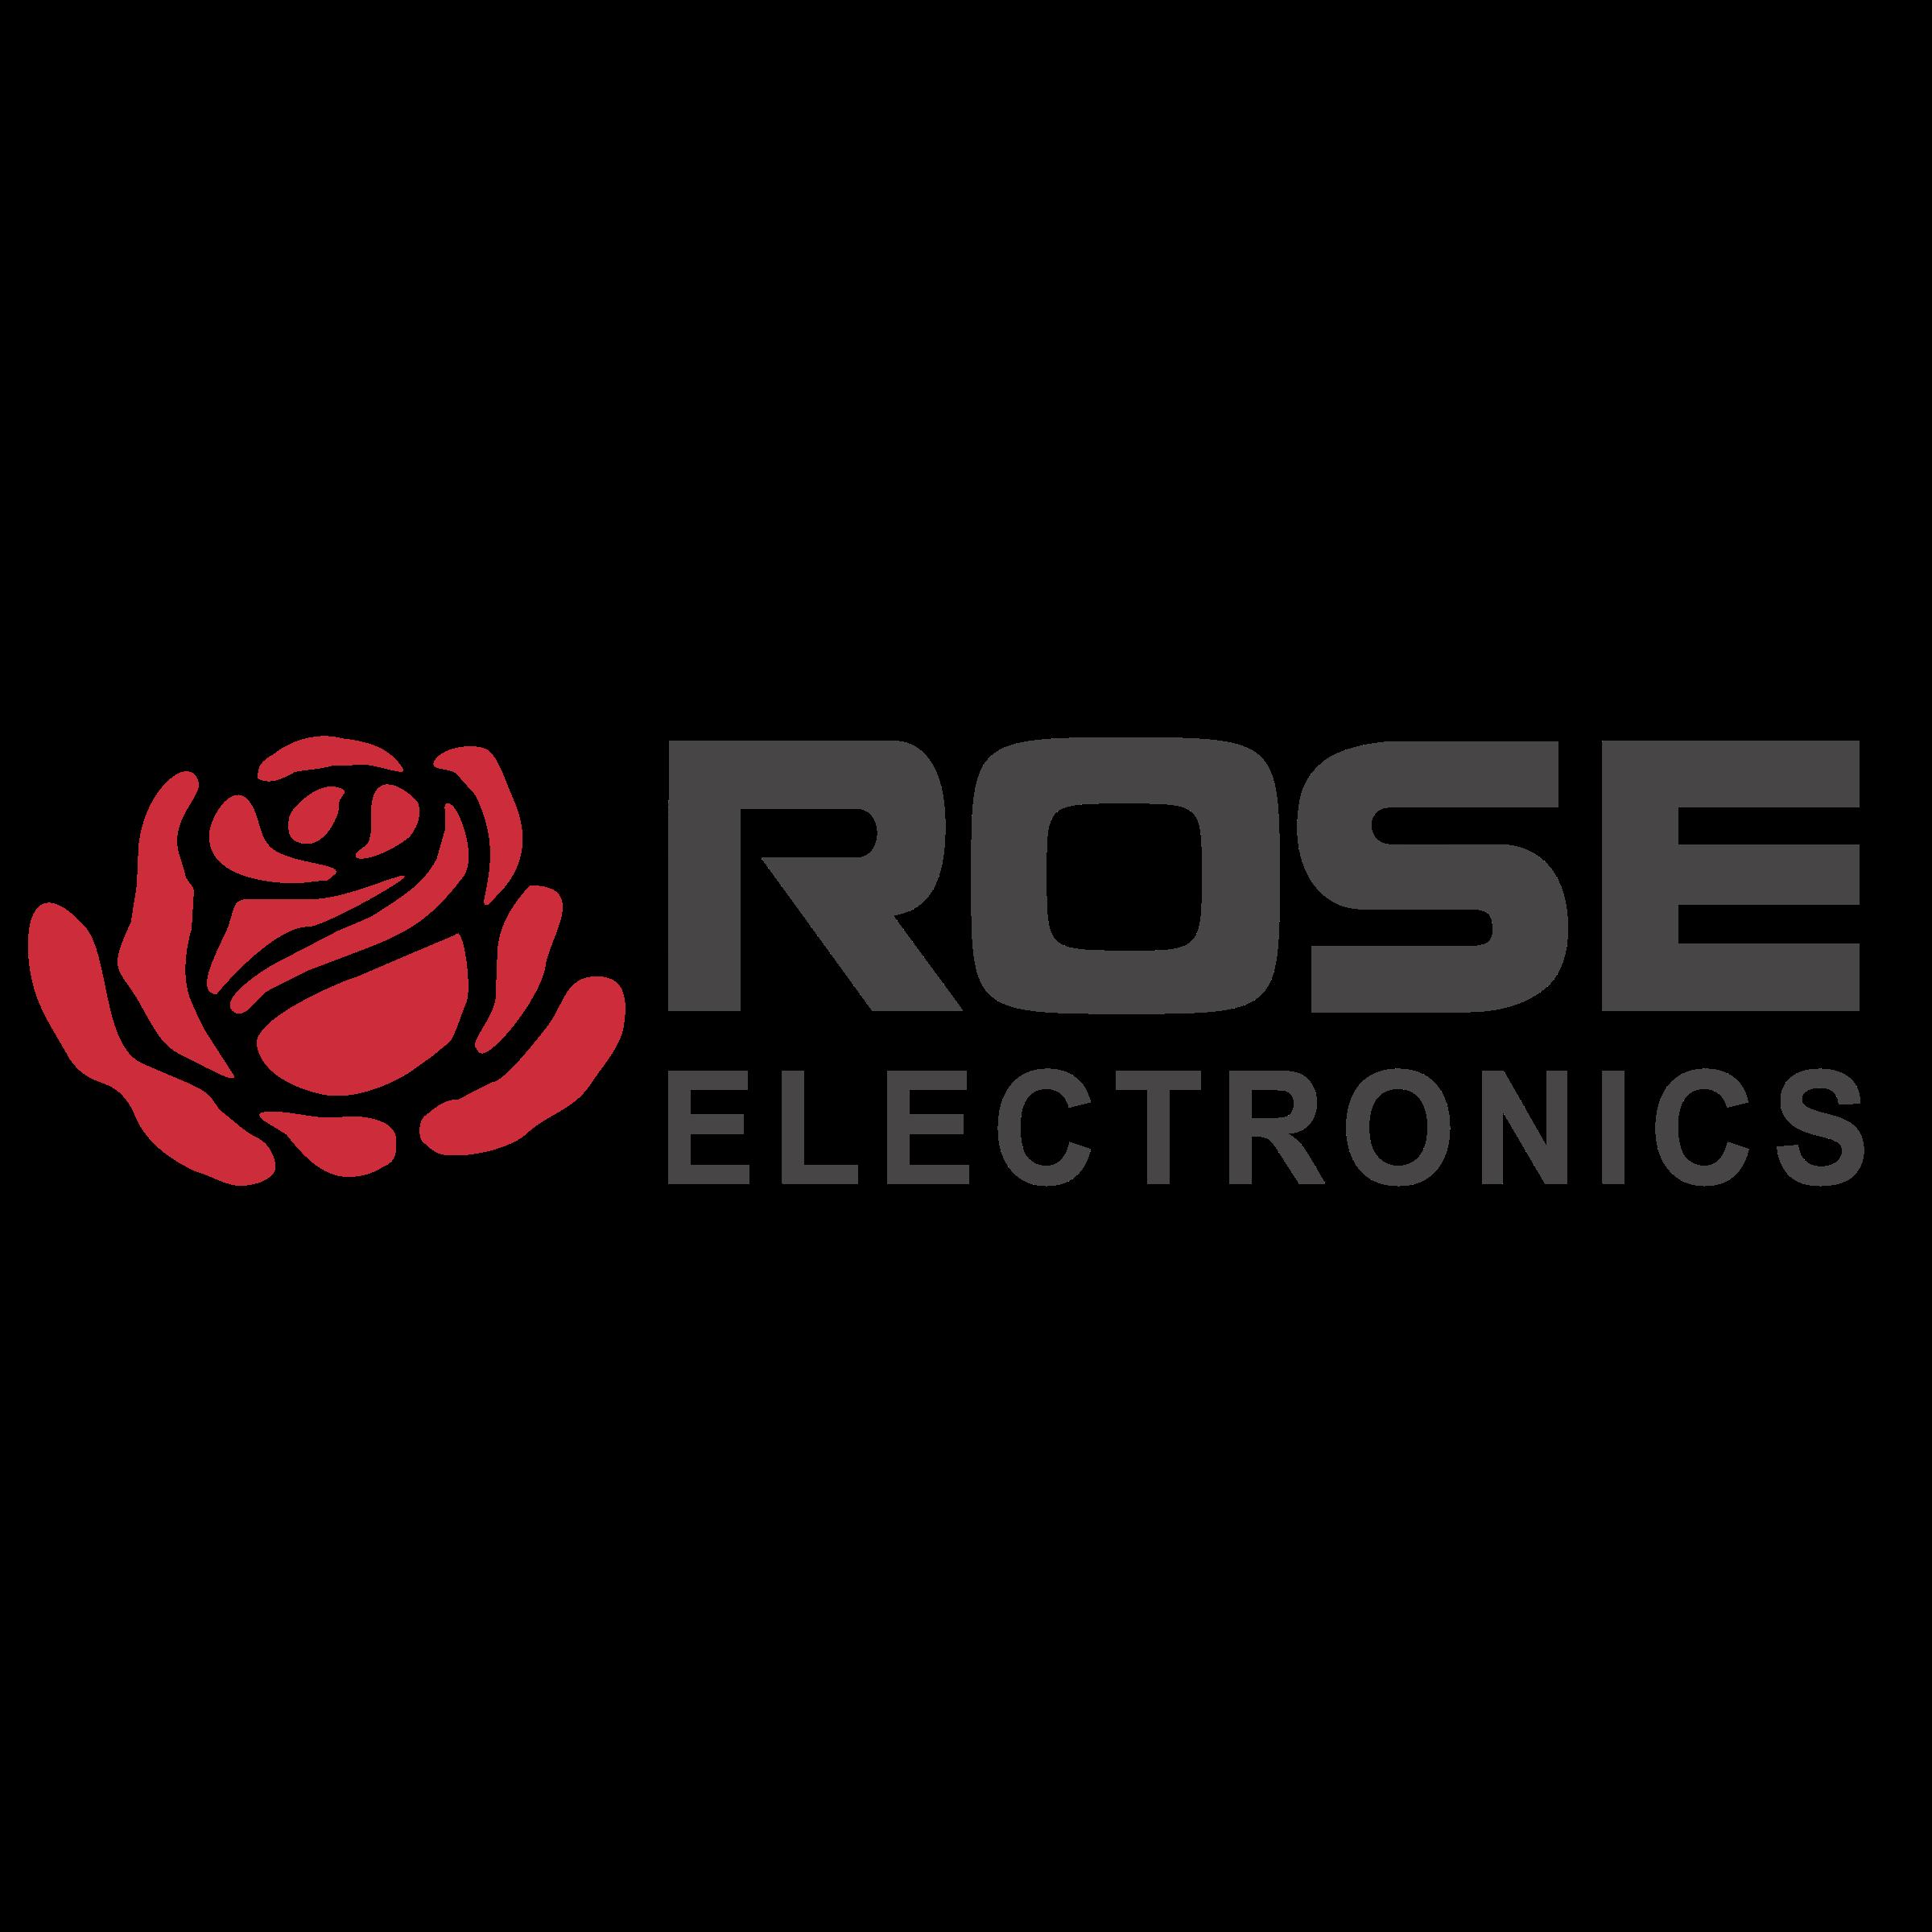 Rose Electronics Logo Png Transparent Svg Vector Freebie Supply